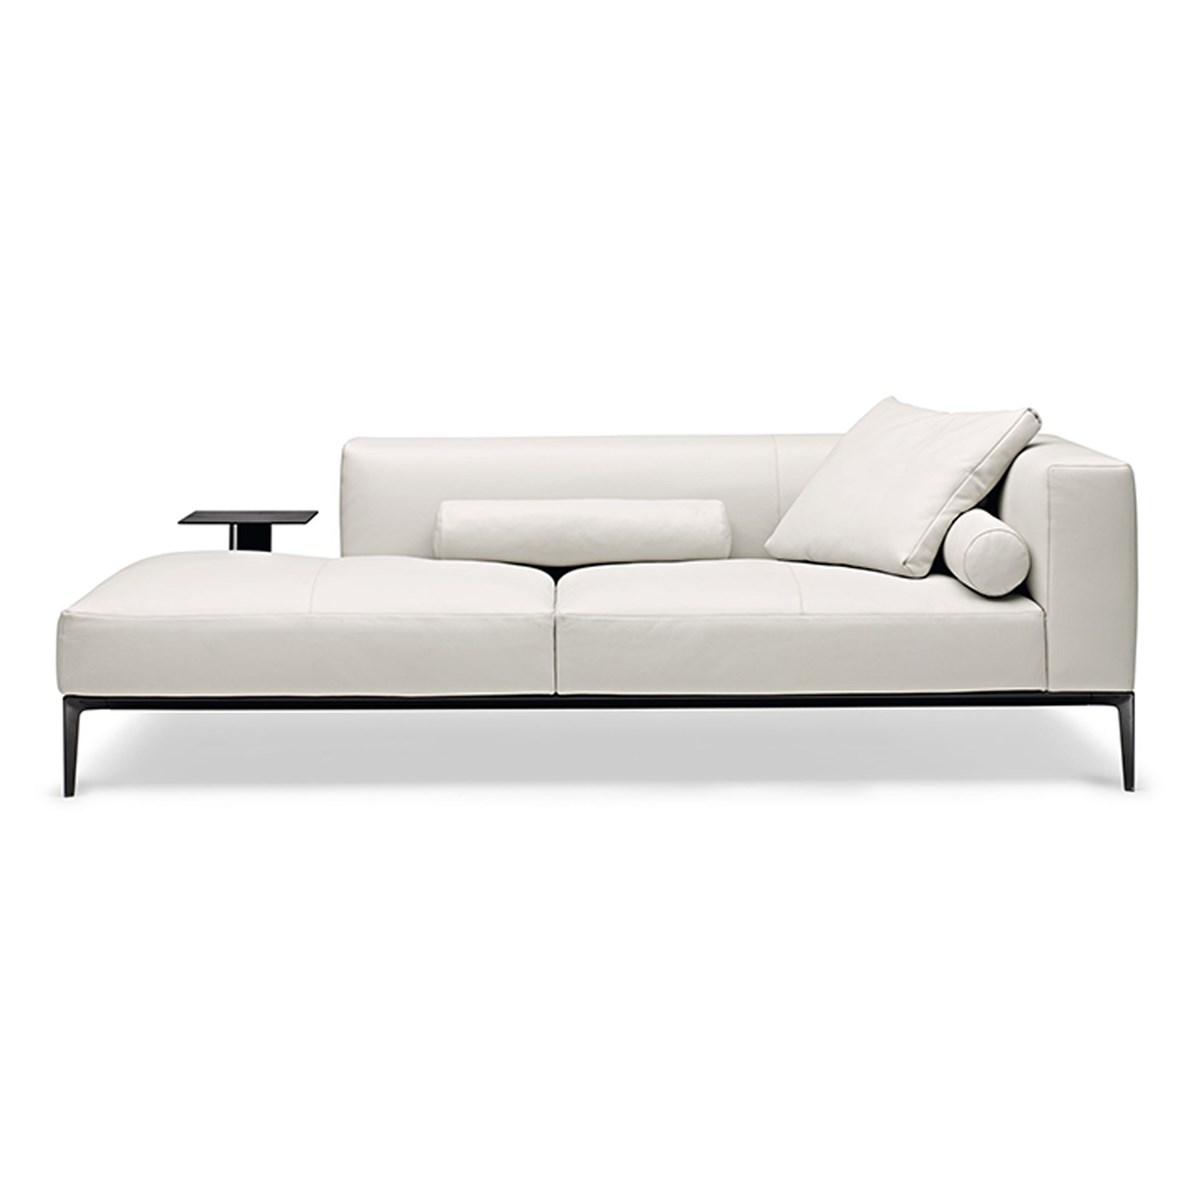 Walter-Knoll-EOOS-Jaan-Living-Sofa-Matisse-1